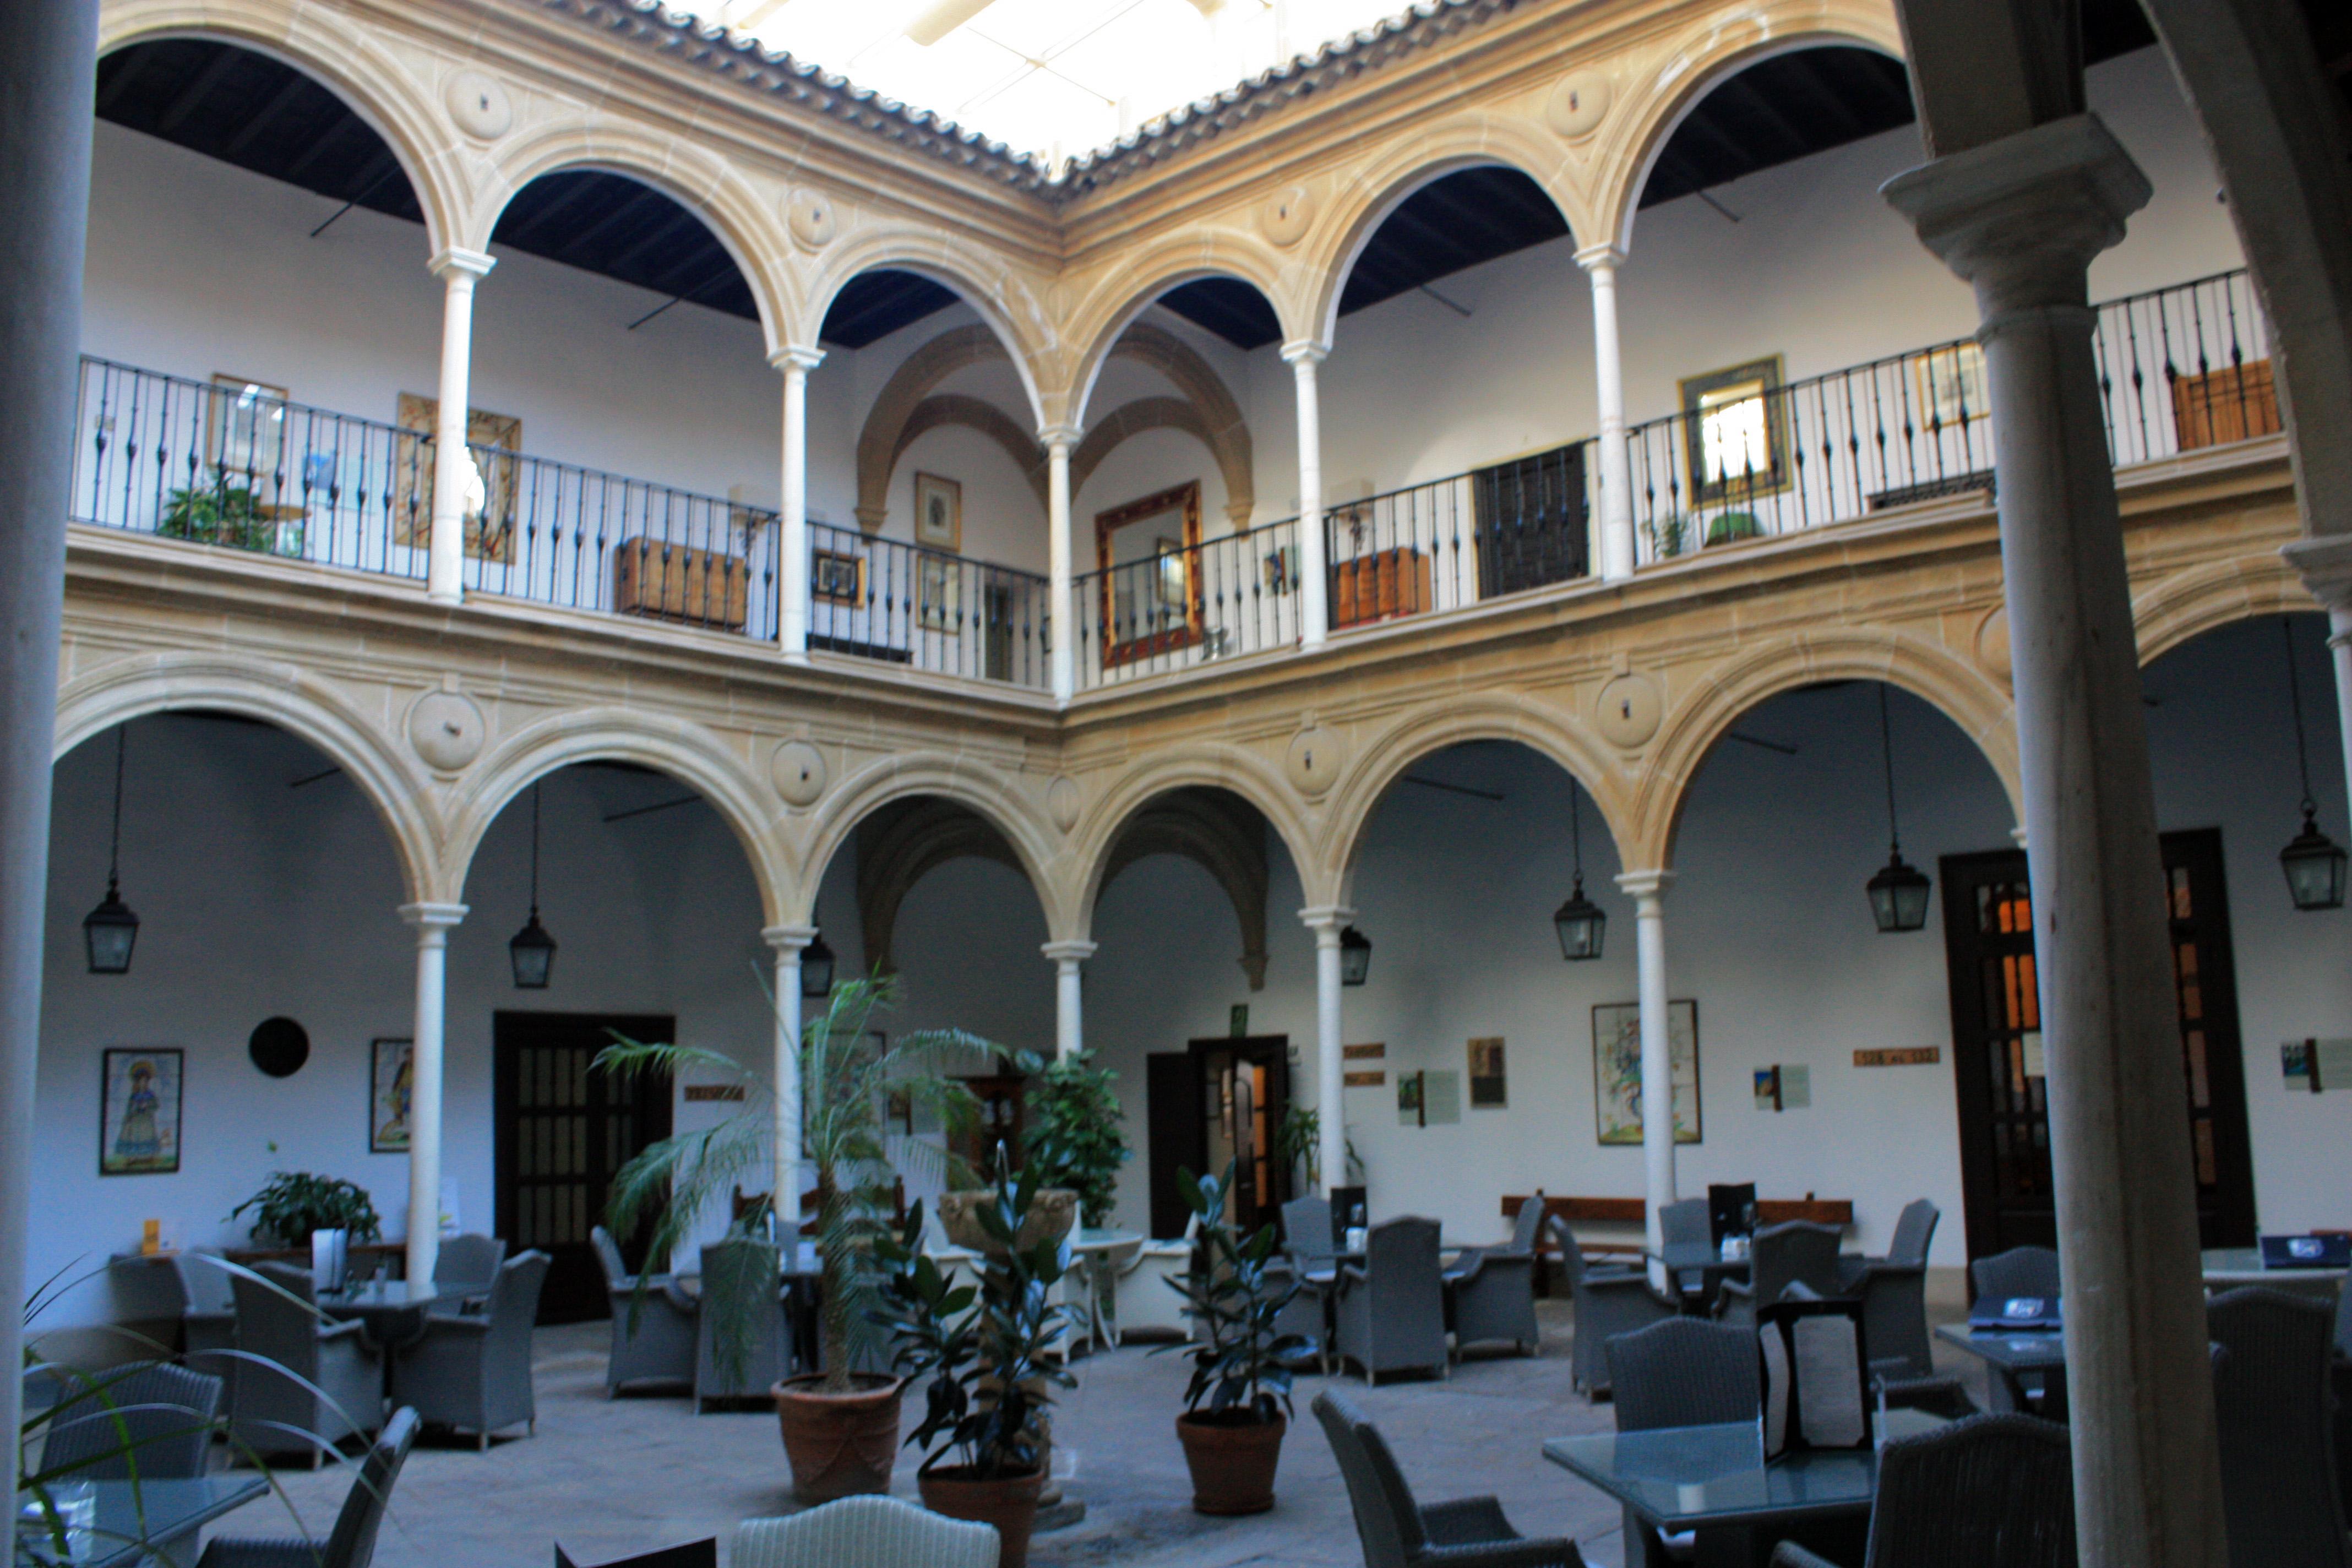 File:Úbeda-Palacio del Déan Ortega-Patio-20110919.jpg - Wikimedia Commons